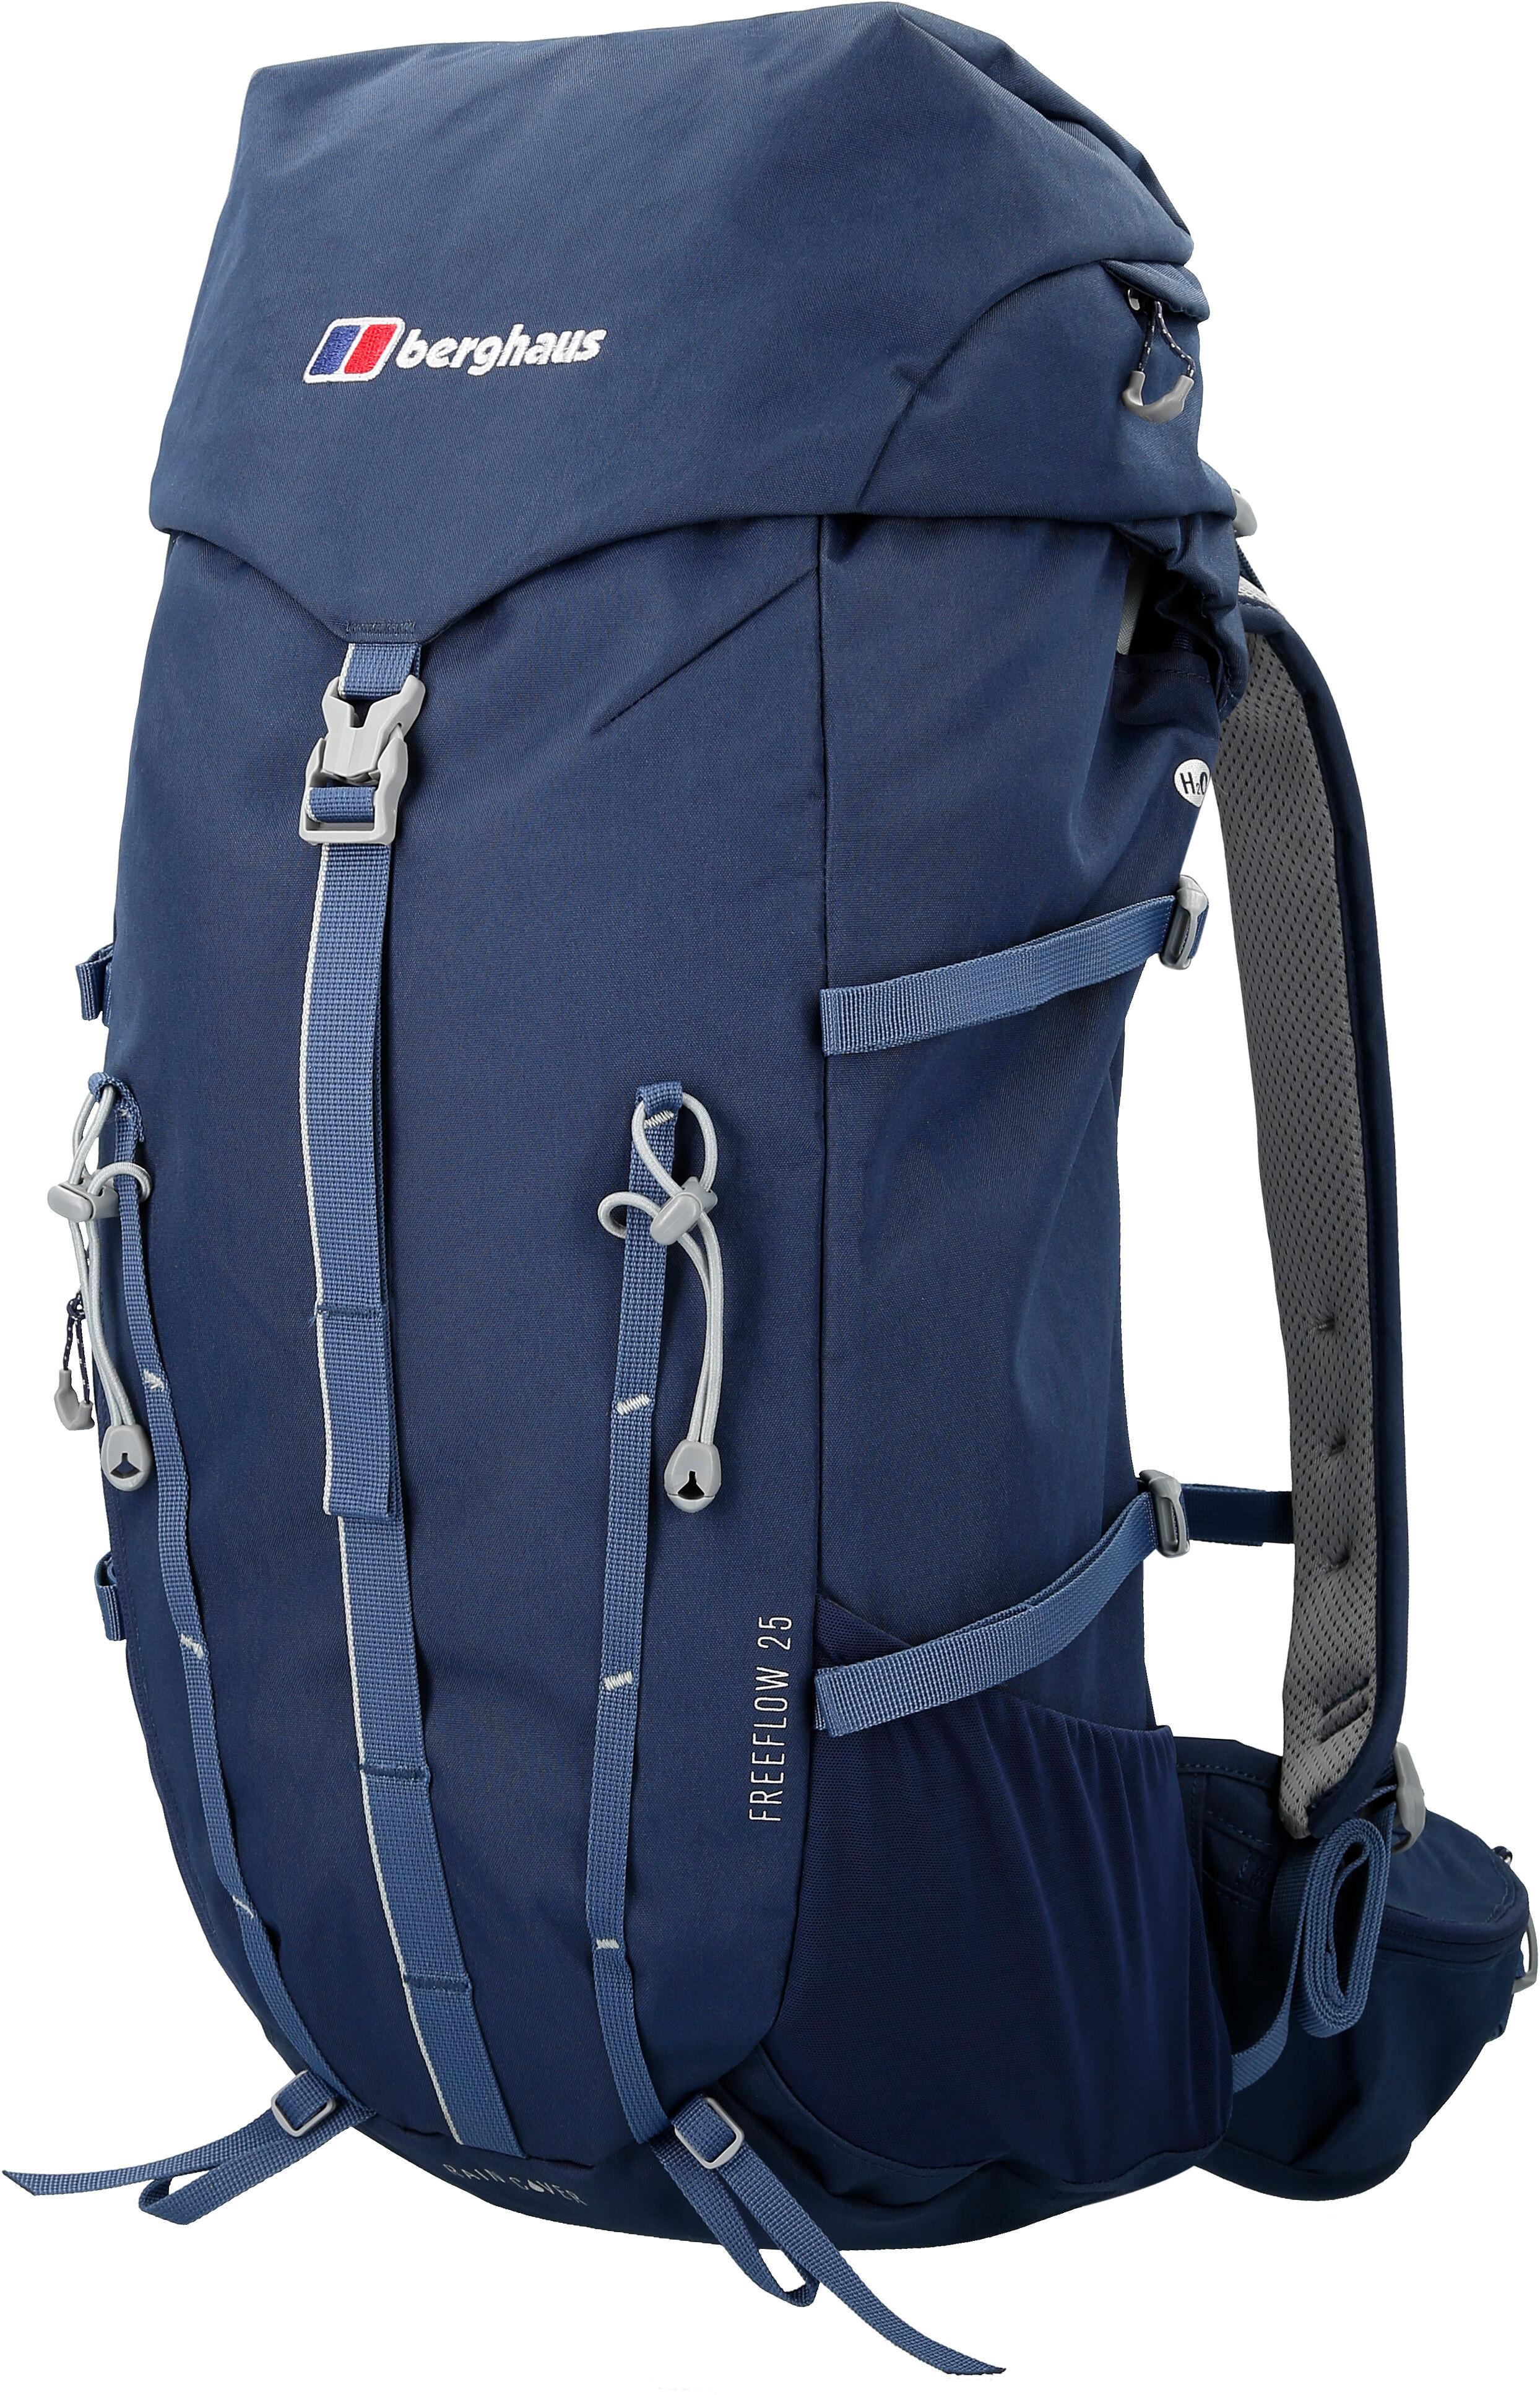 f854f08ebff Berghaus Freeflow 25 rugzak Dames blauw l Online outdoor shop Campz.nl